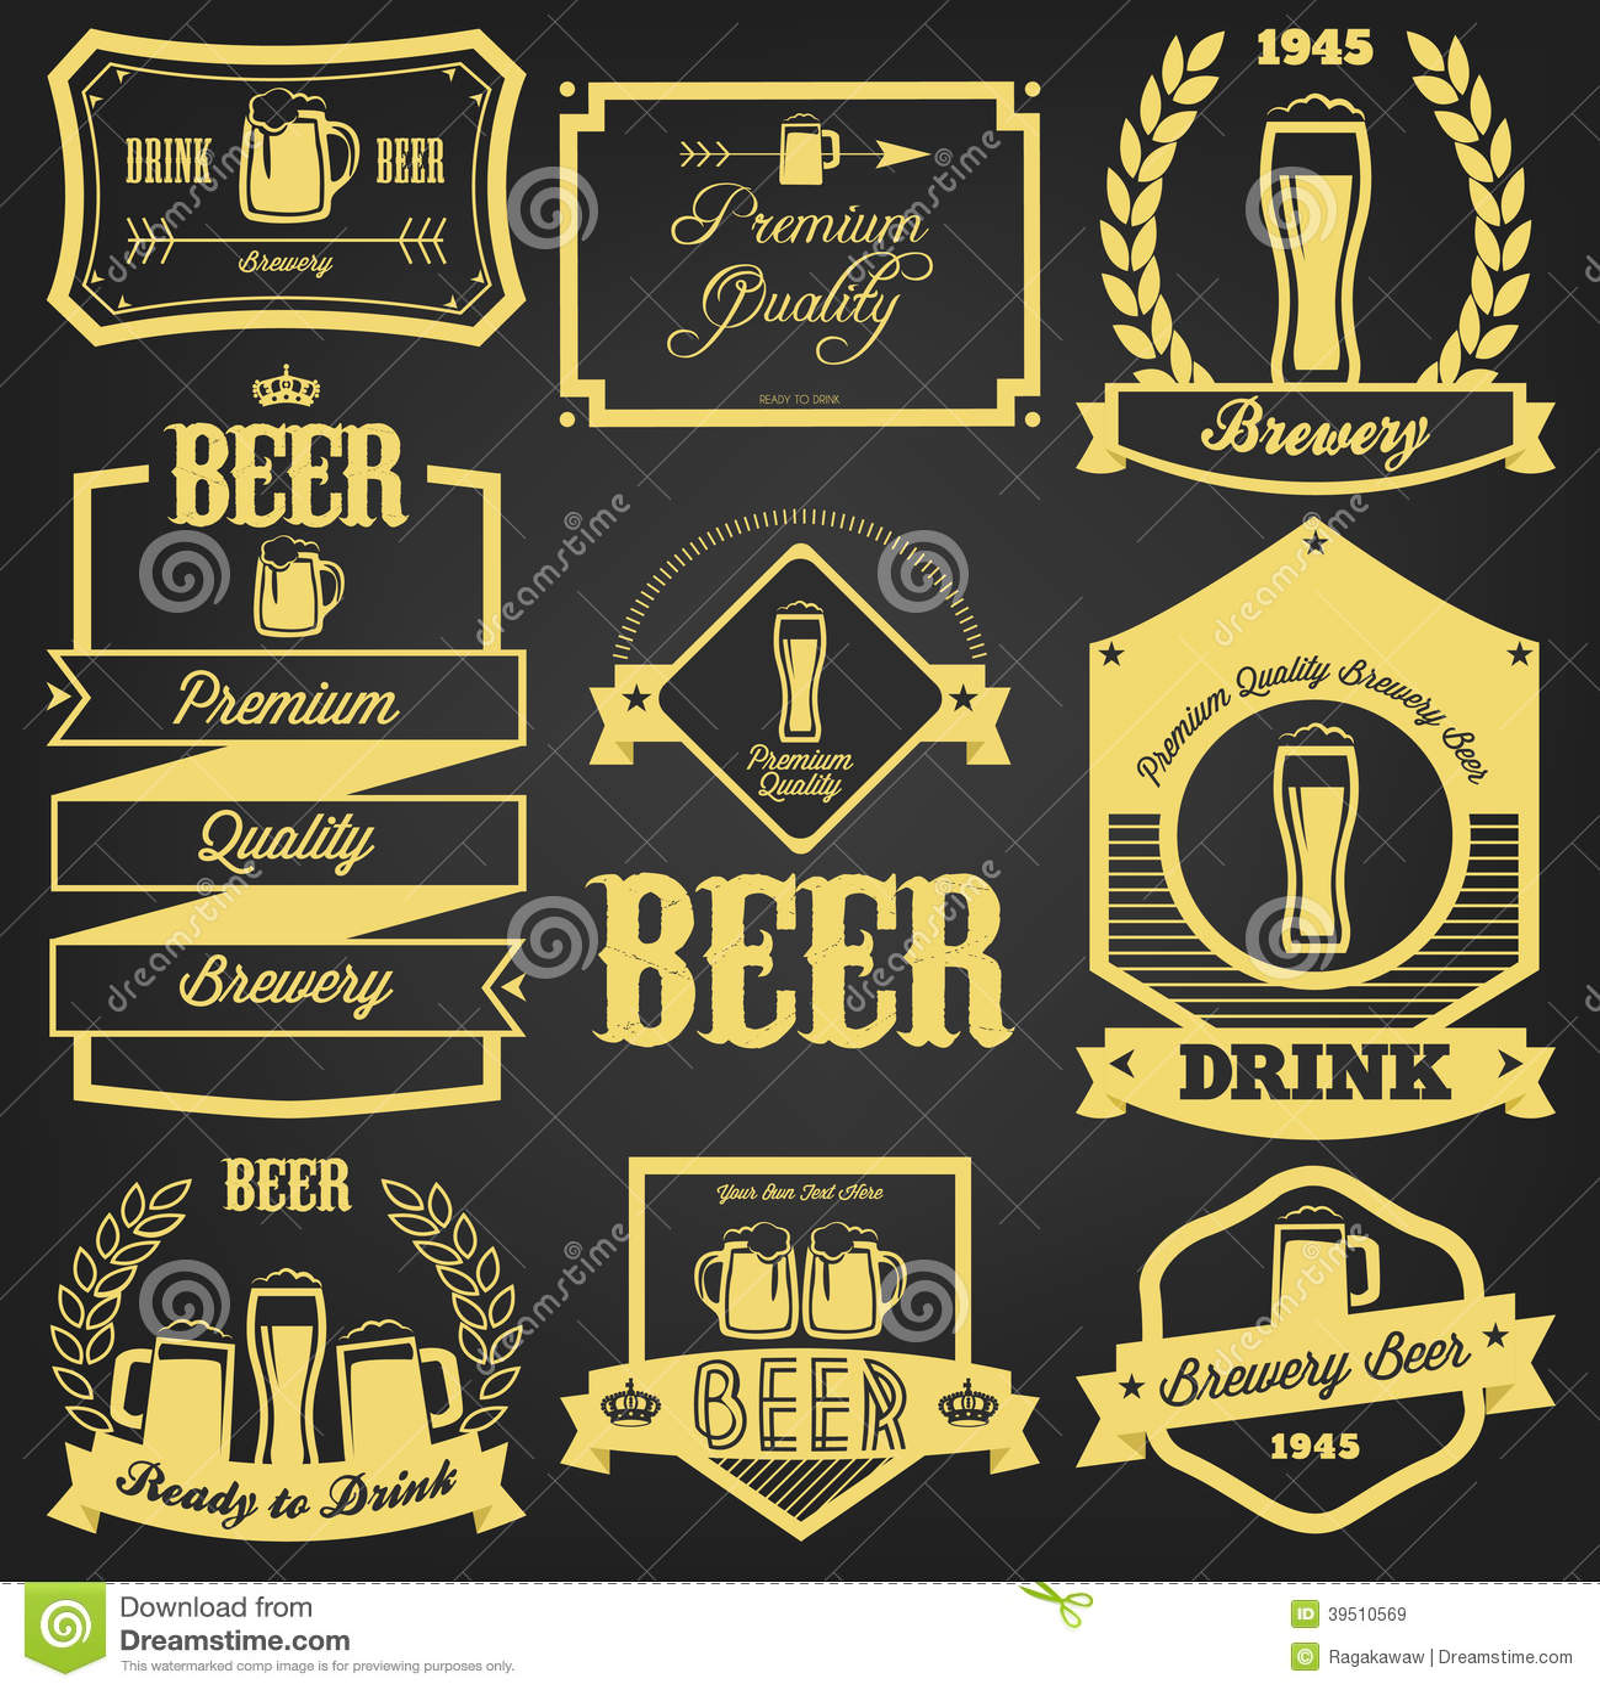 Download Premium Beer Label Design stock vector. Illustration of artwork - 39510569